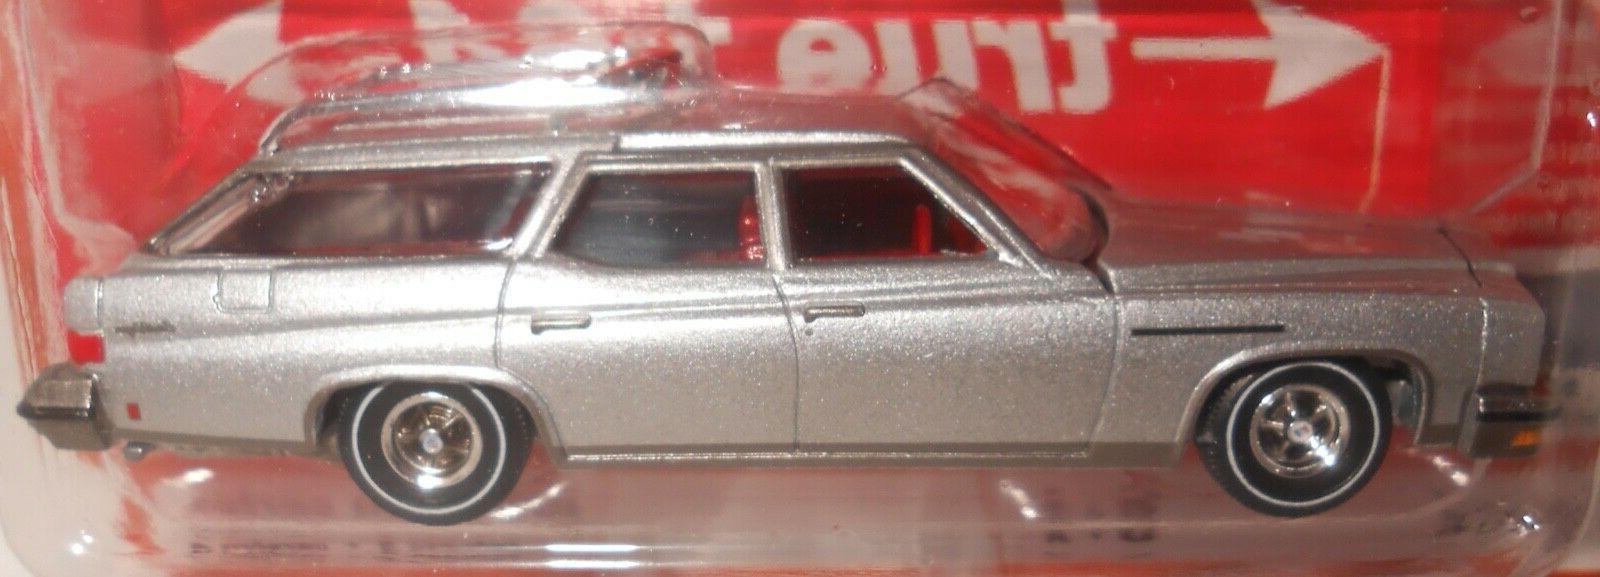 AUTO Estate Wagon Silver Muscle Wagons 2020